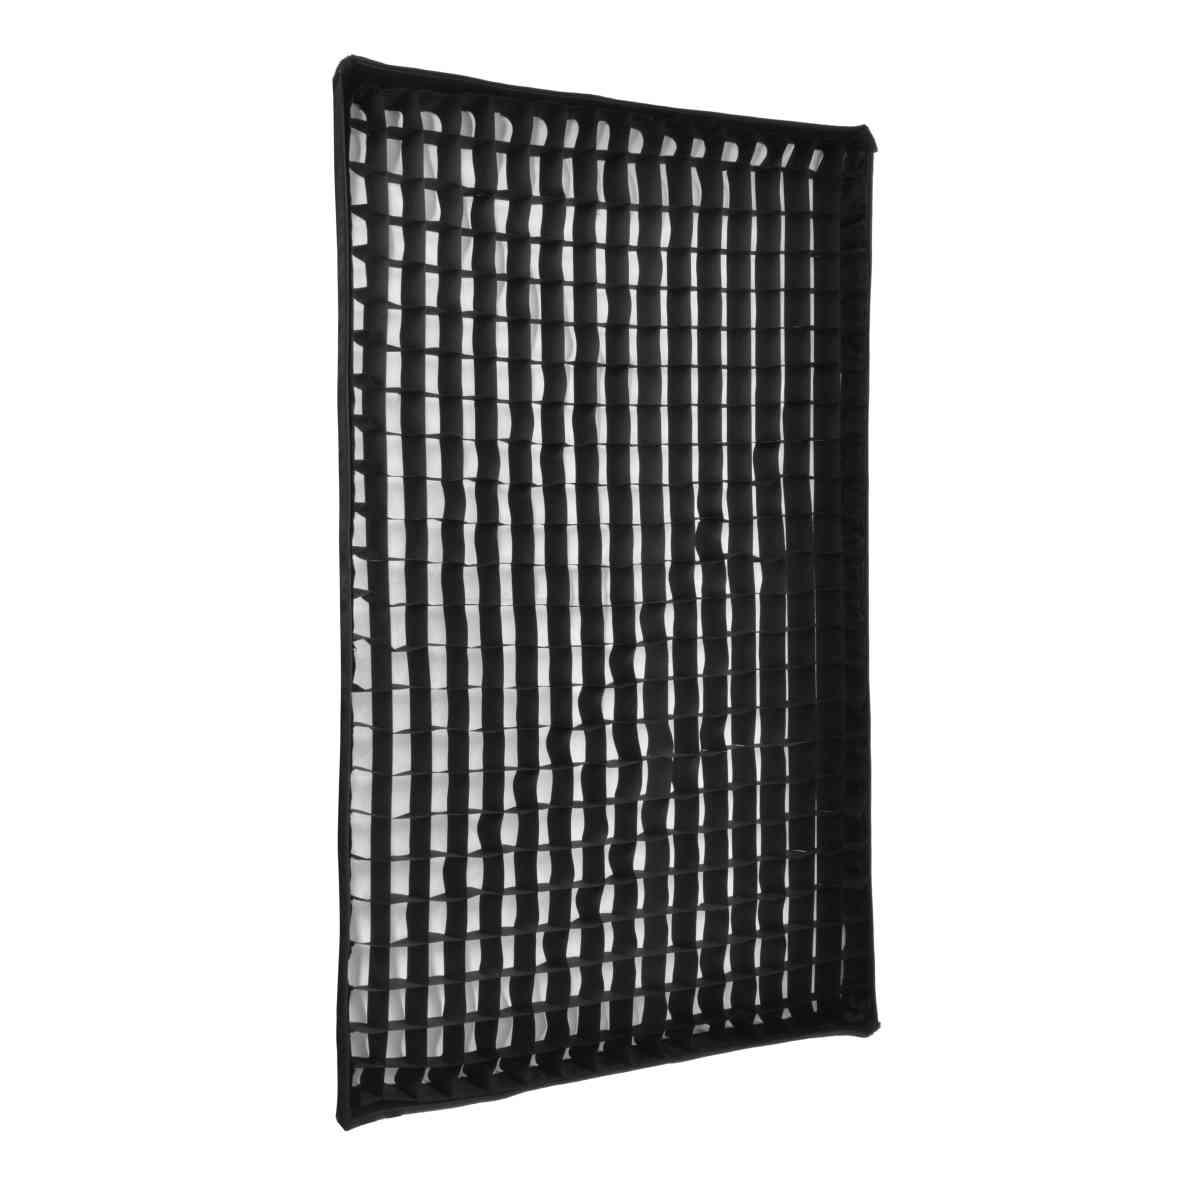 Walimex pro Grid for Umbrella Softbox 70x100cm